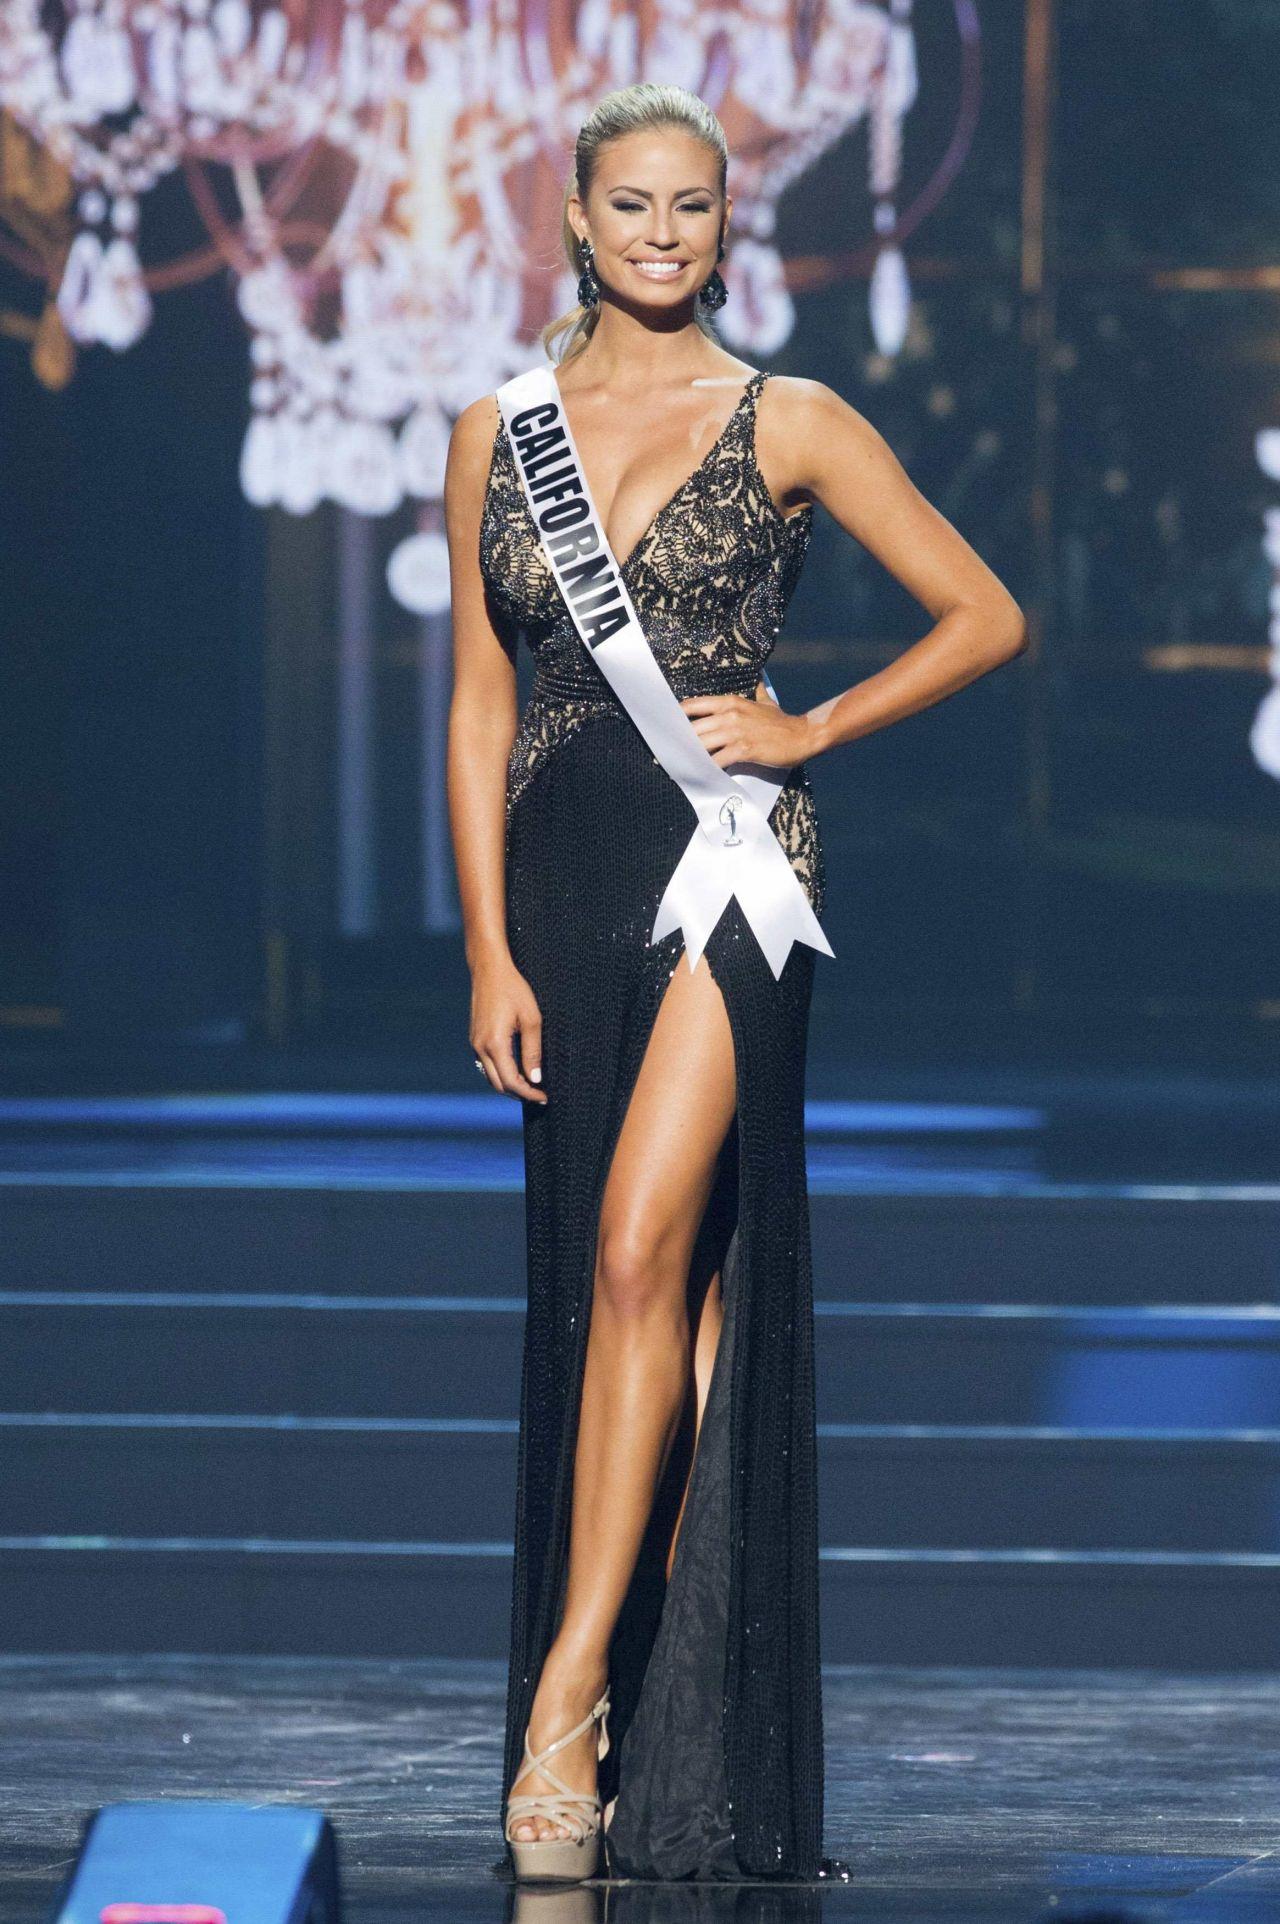 Cassandra Kunze (California) - Miss USA Preliminary Competition - June 2014